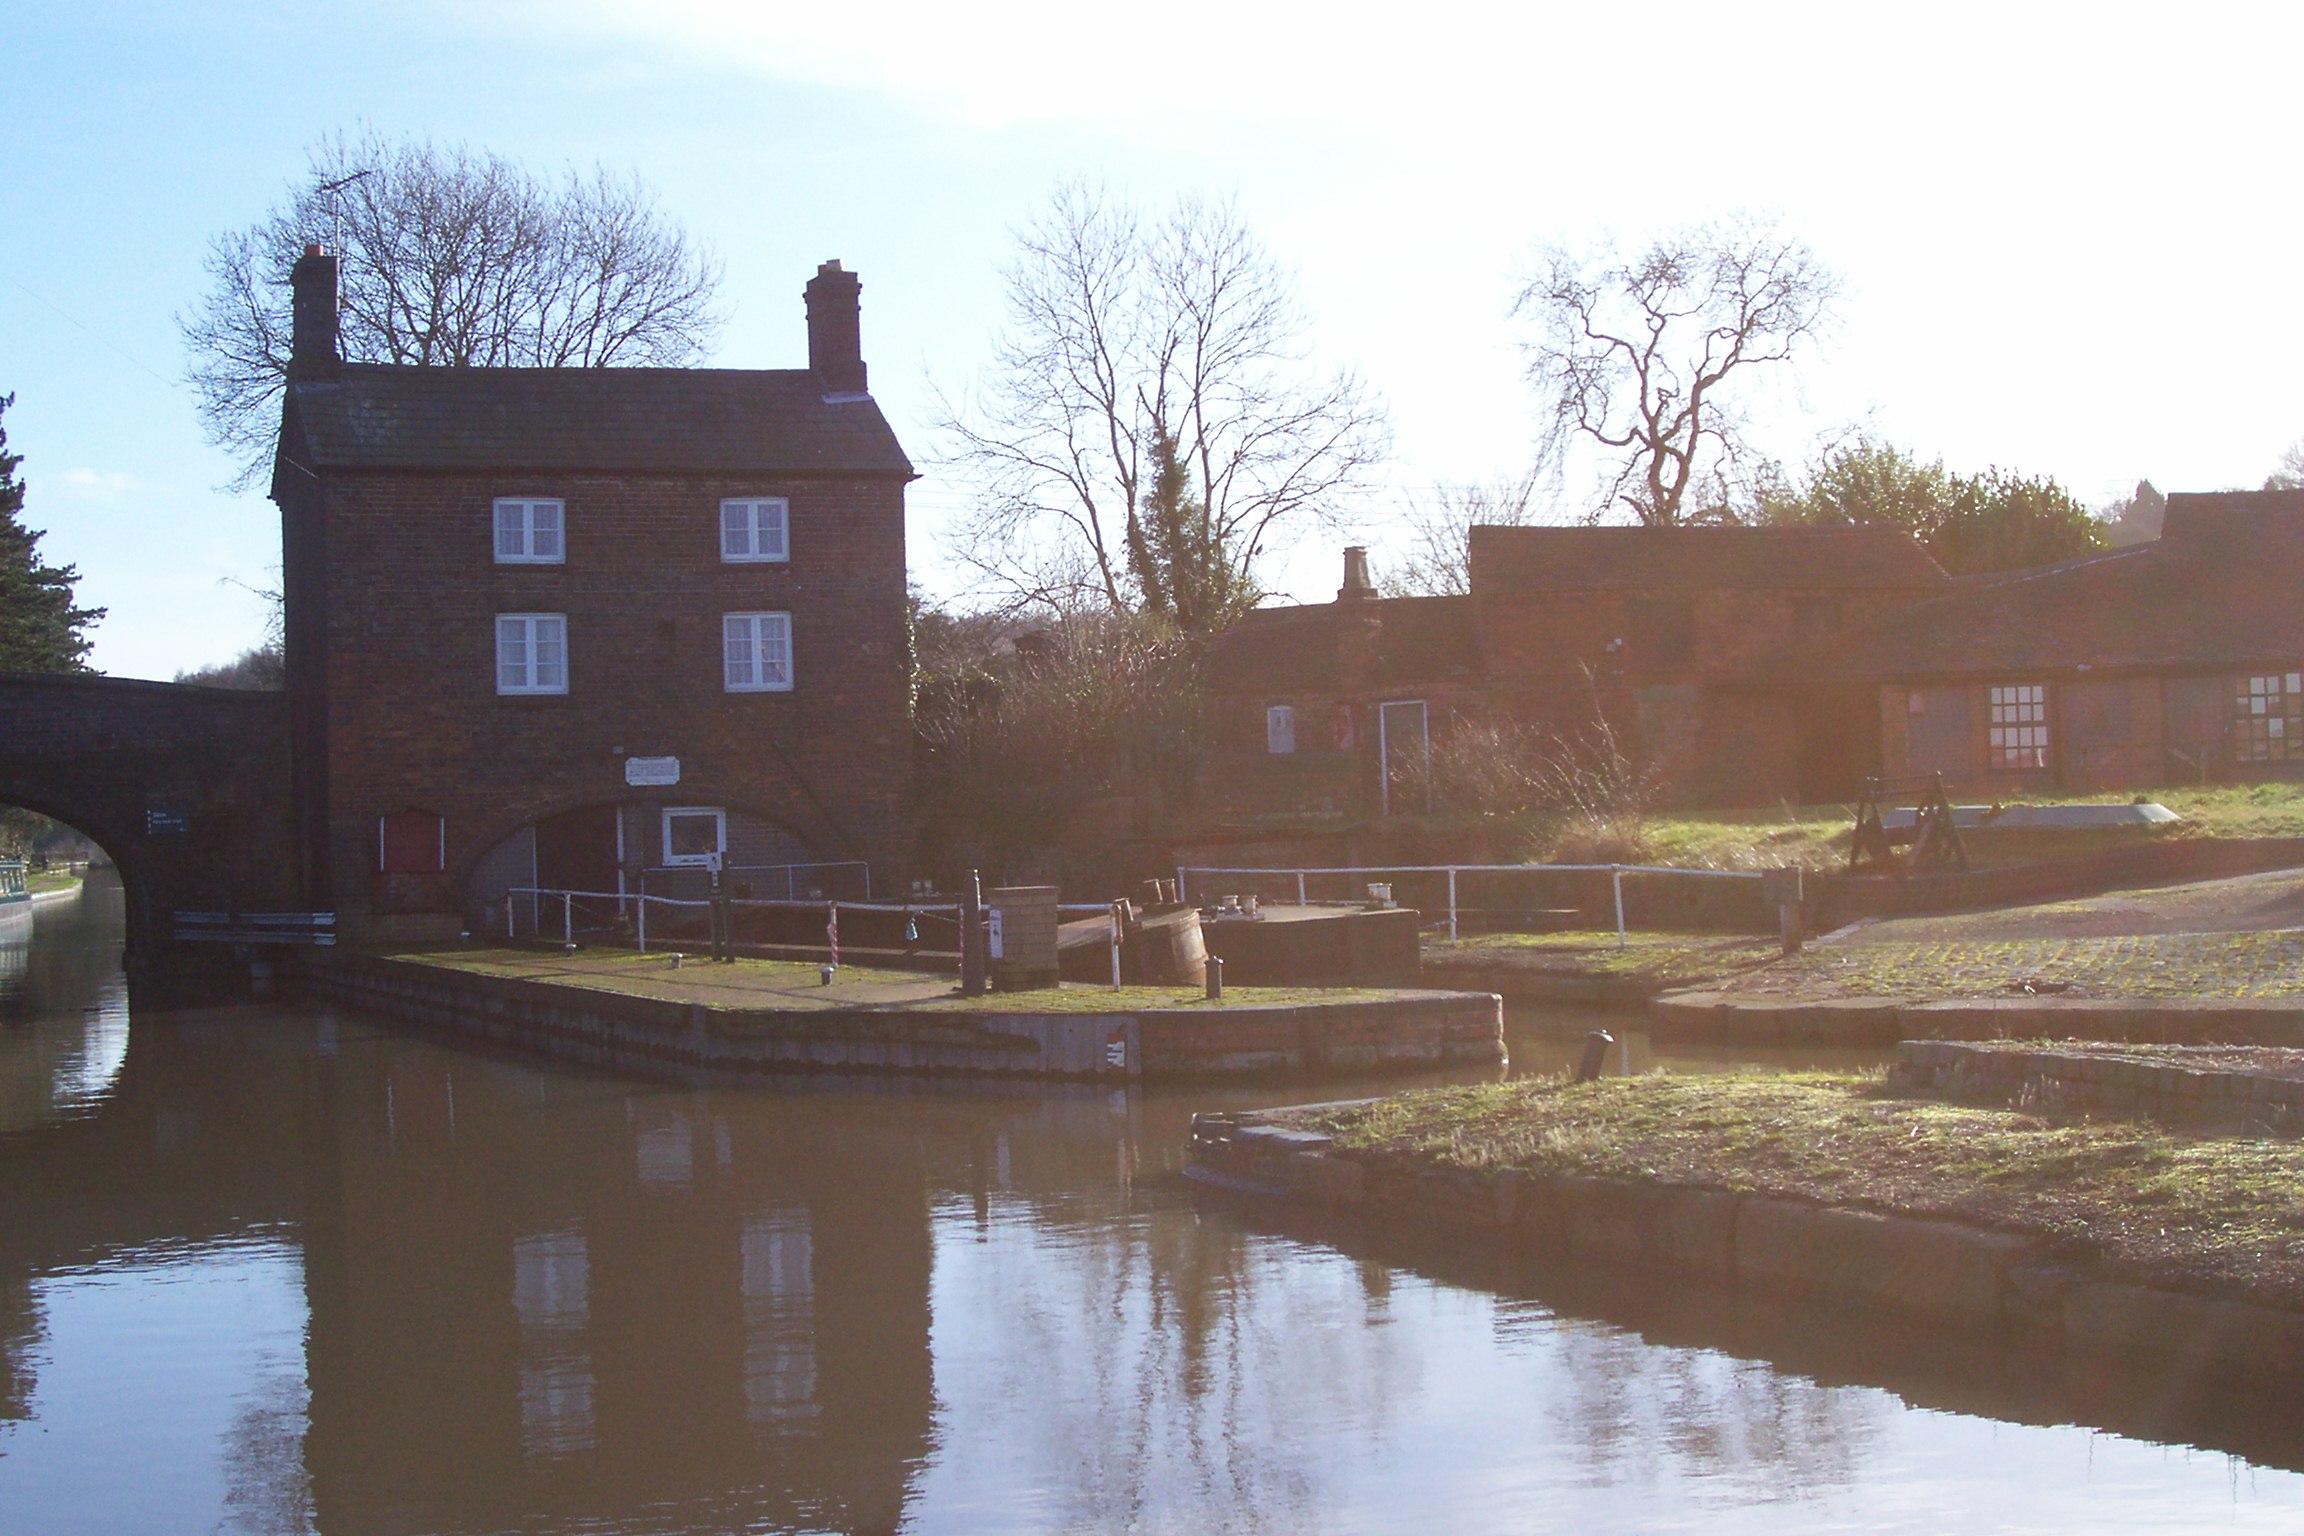 Hartshill Boatyard Manager's House